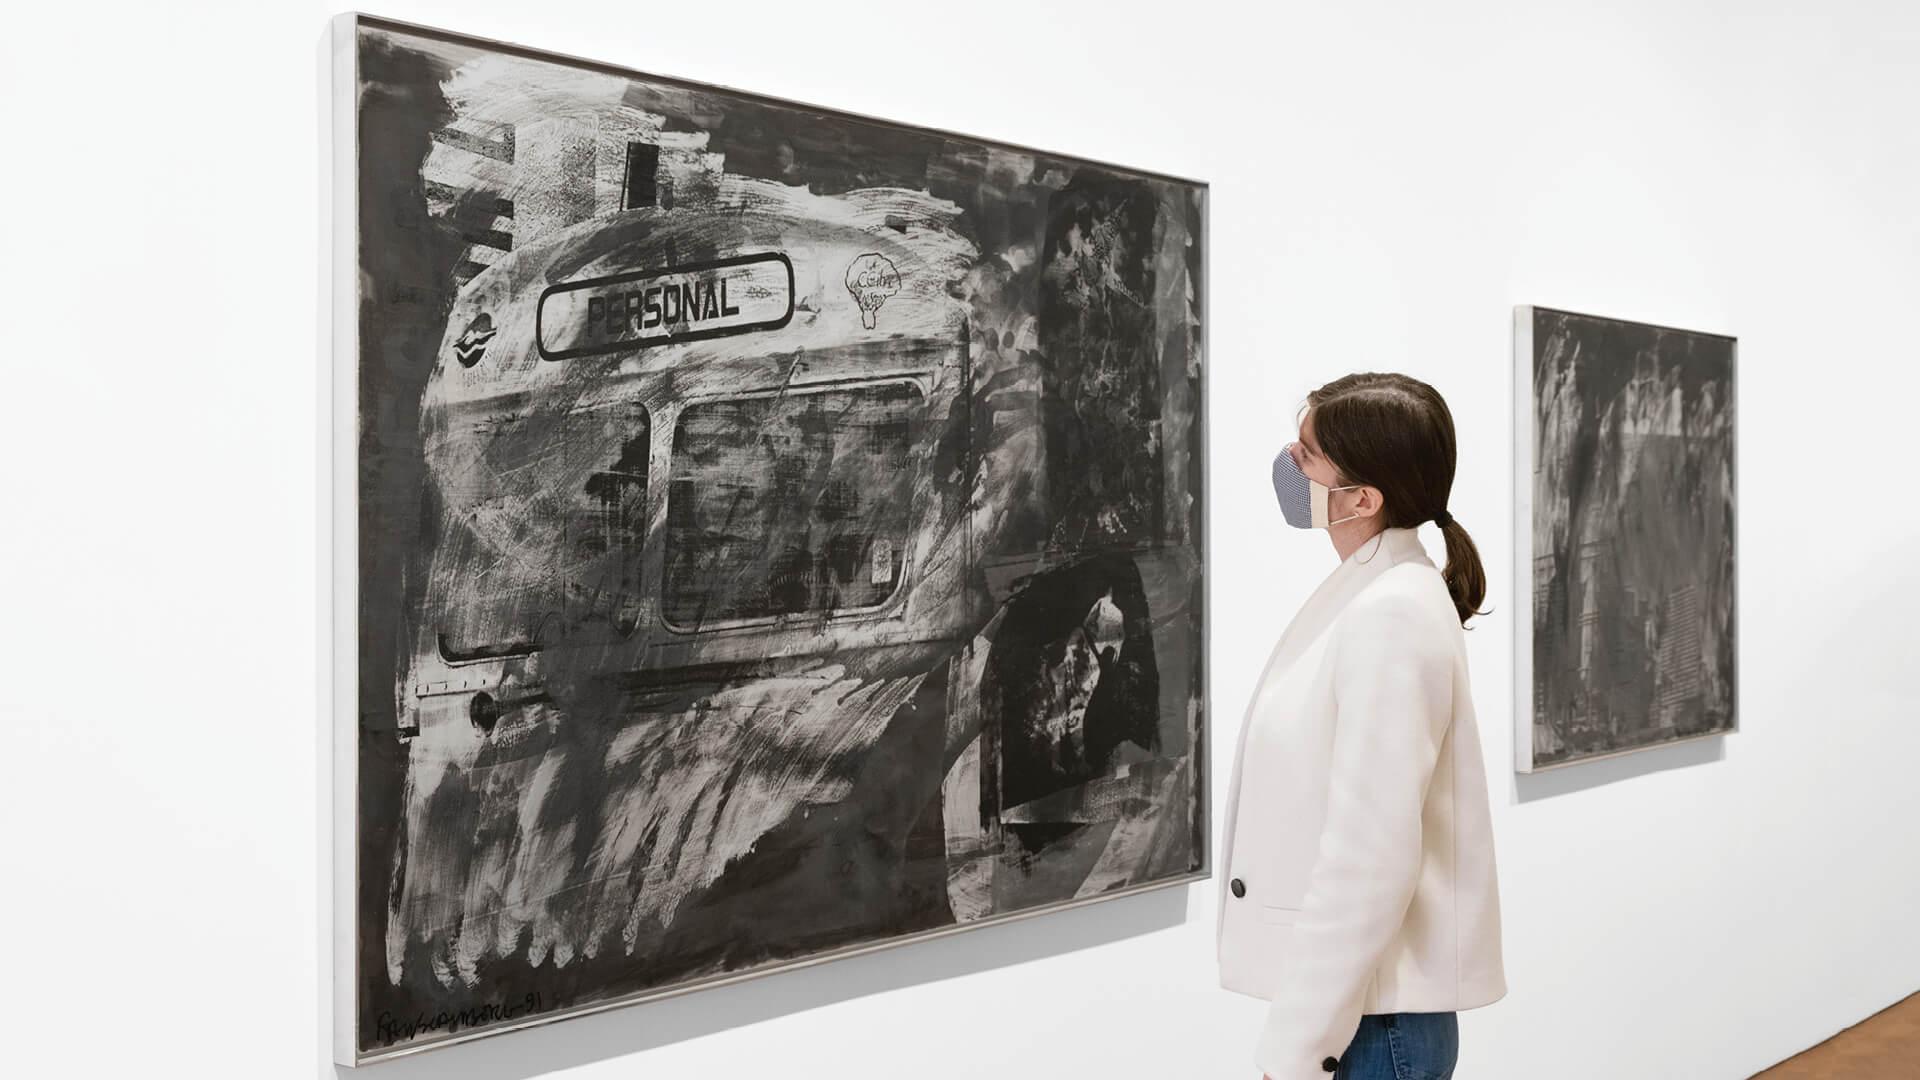 Installation view, Robert Rauschenberg, Night Shades and Phantoms, Thaddaeus Ropac London, 2021 | London Gallery Weekend 2021 | STIRworld